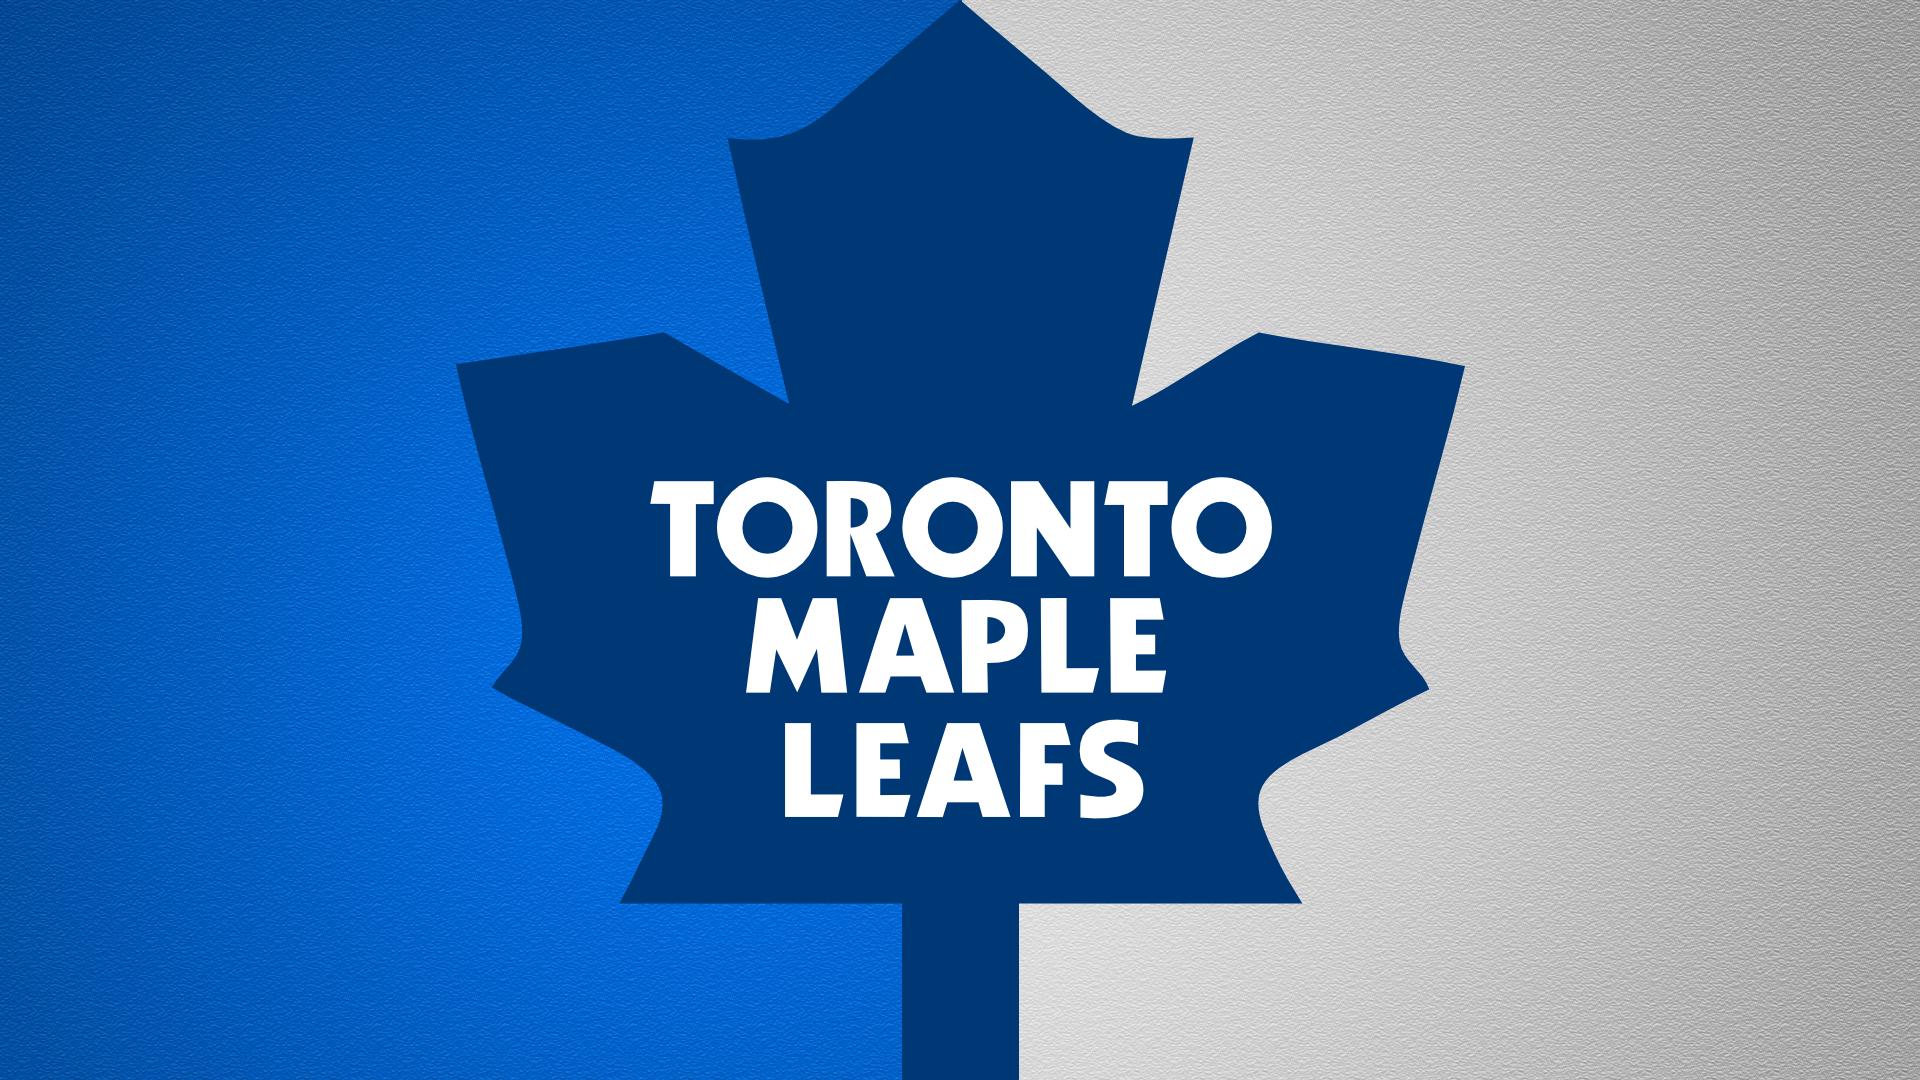 Toronto Maple Leafs Home Opener